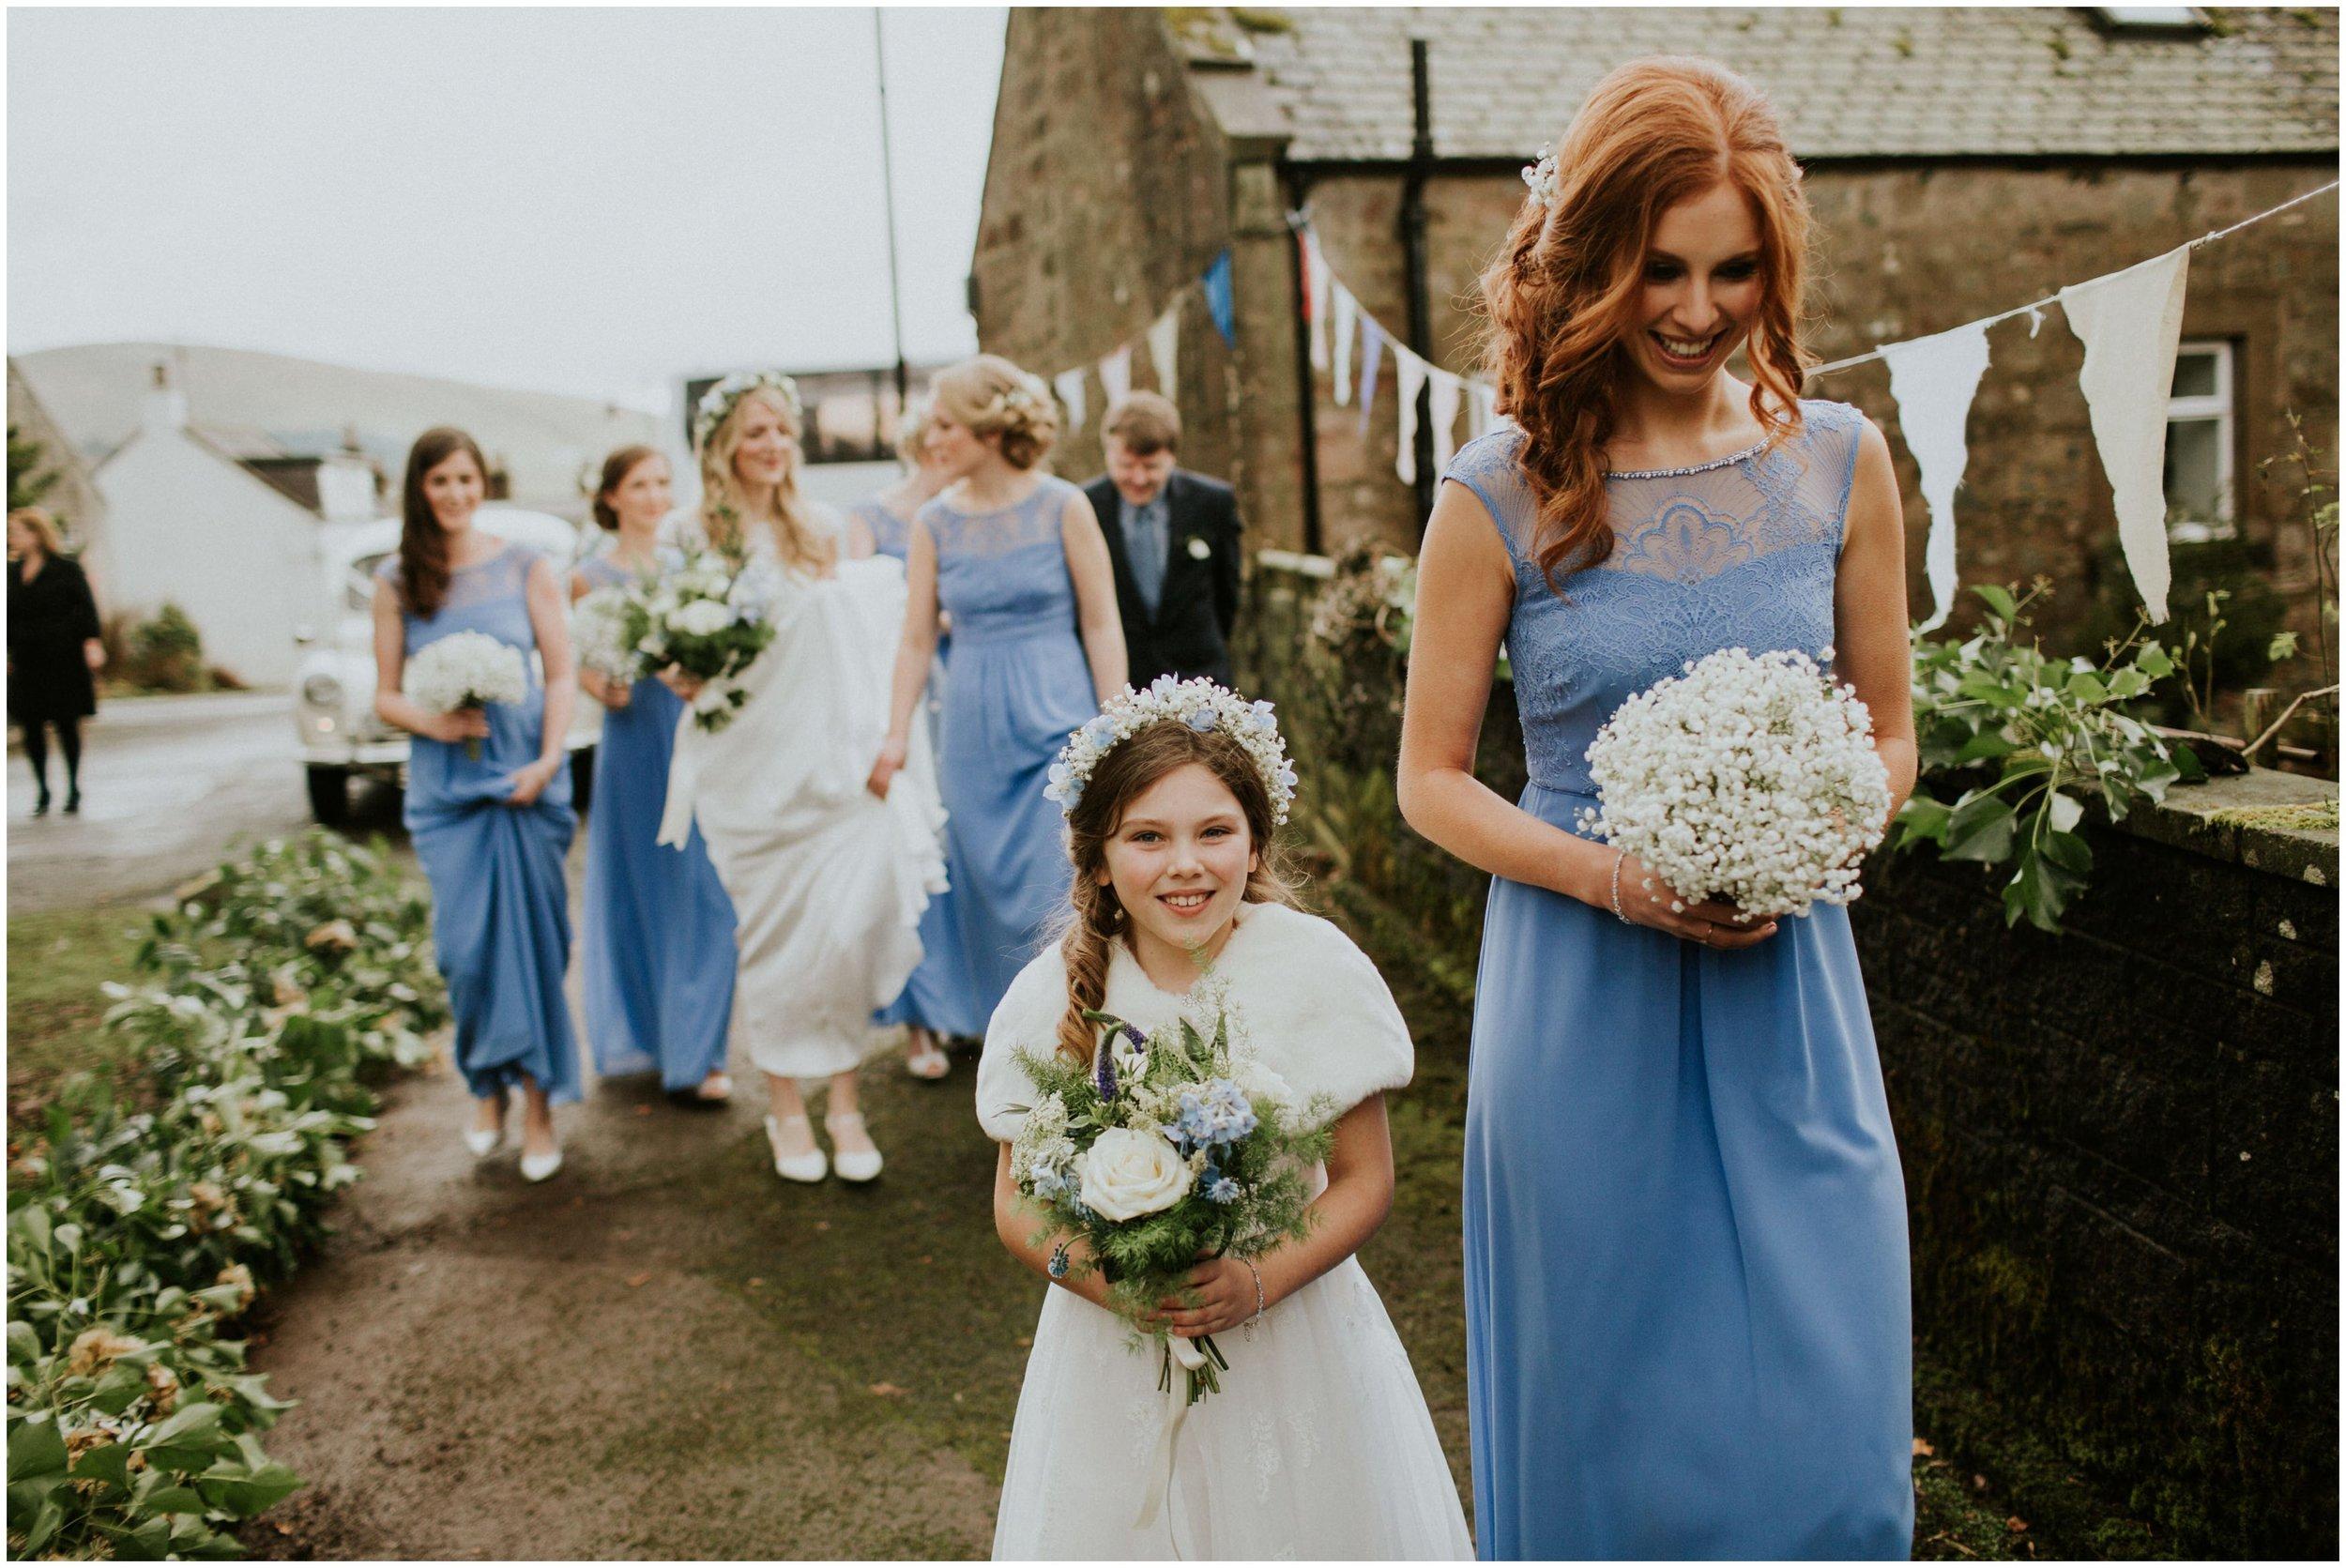 Photography 78 - Glasgow Wedding Photographer - Dave & Alana_0029.jpg